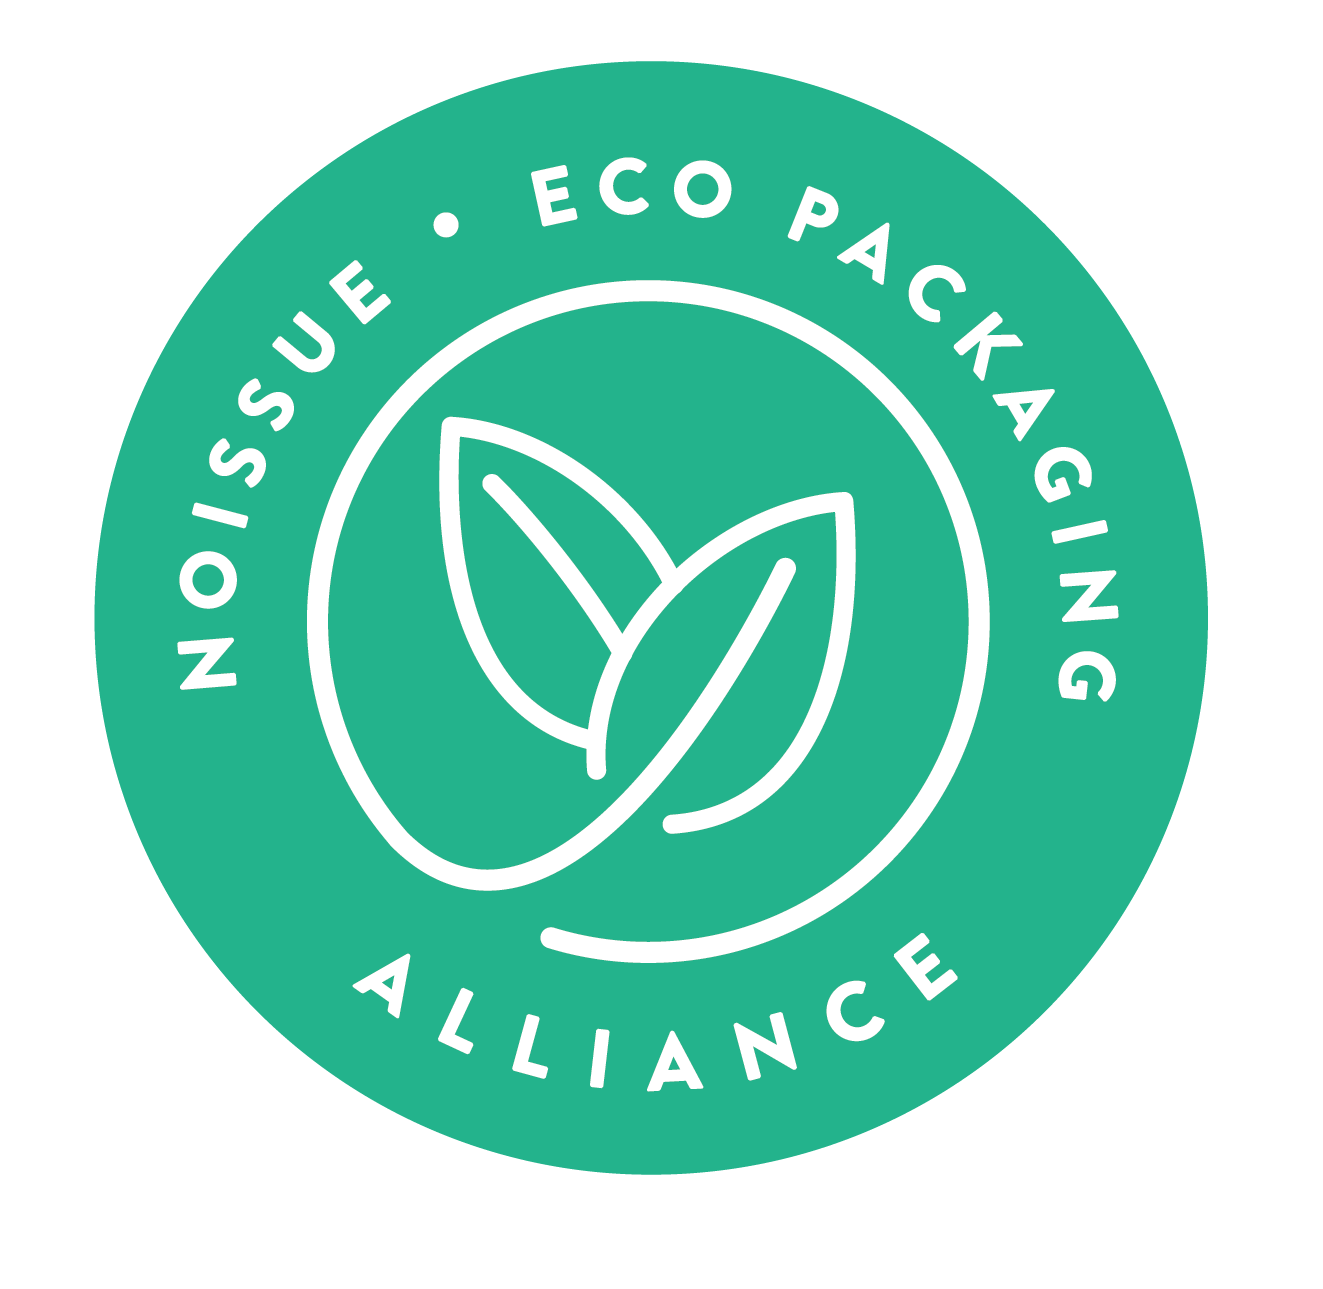 Caroline Jones- Eco alliance badge